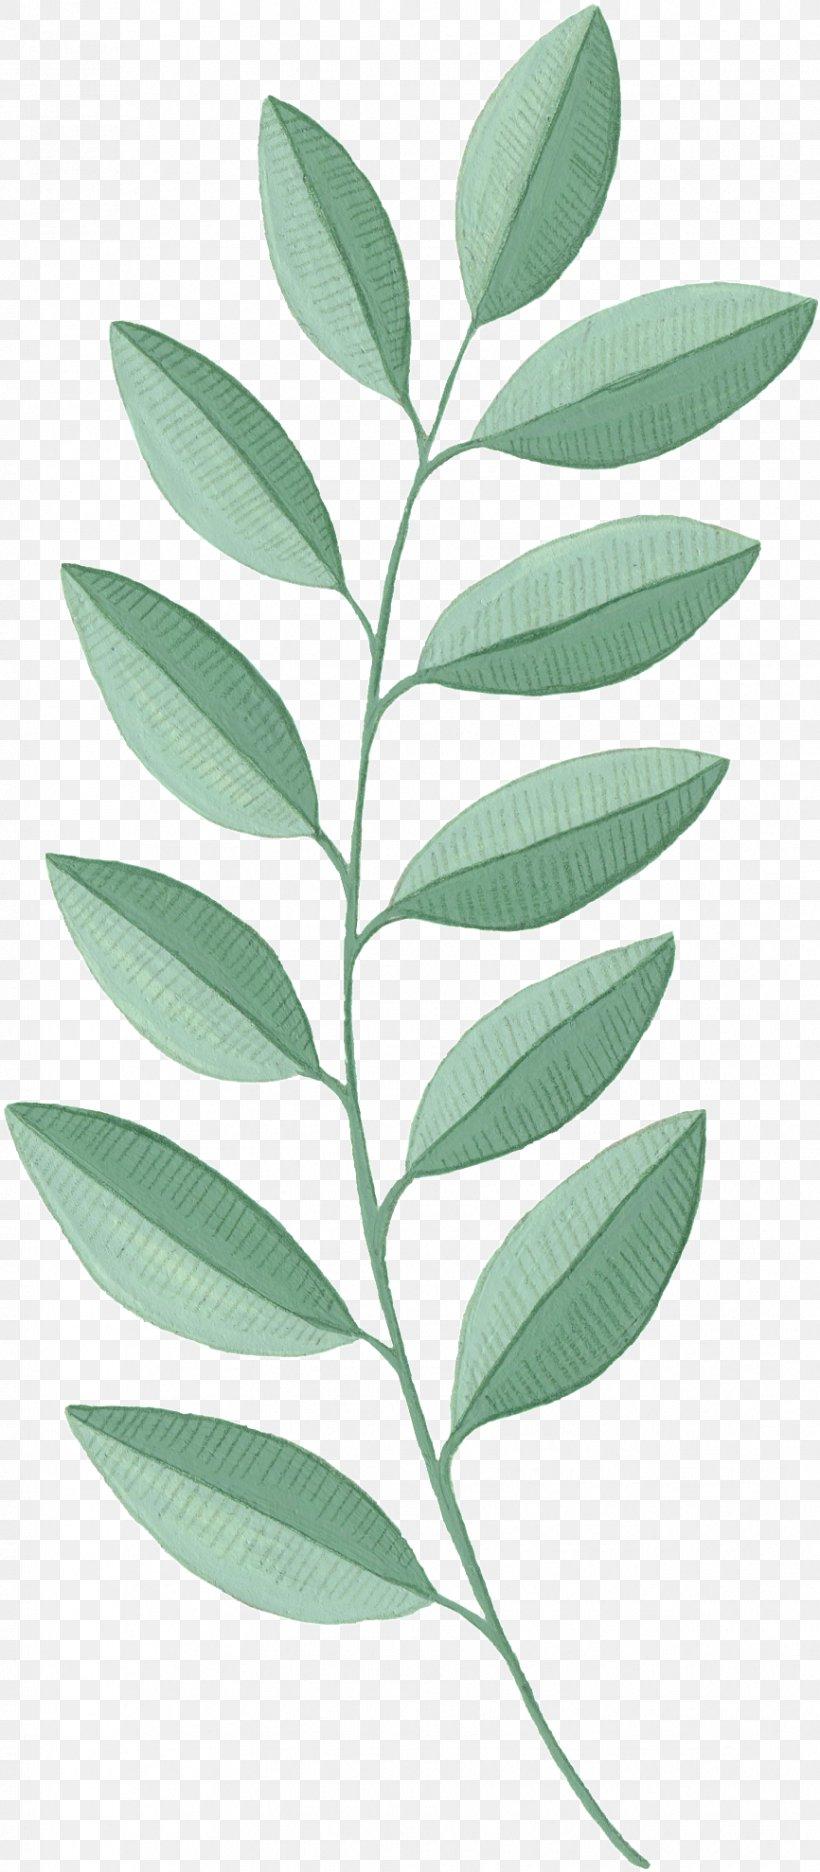 Leaf Plant Flower Tree Woody Plant, PNG, 866x1978px, Leaf, Flower, Herbaceous Plant, Plant, Plant Stem Download Free